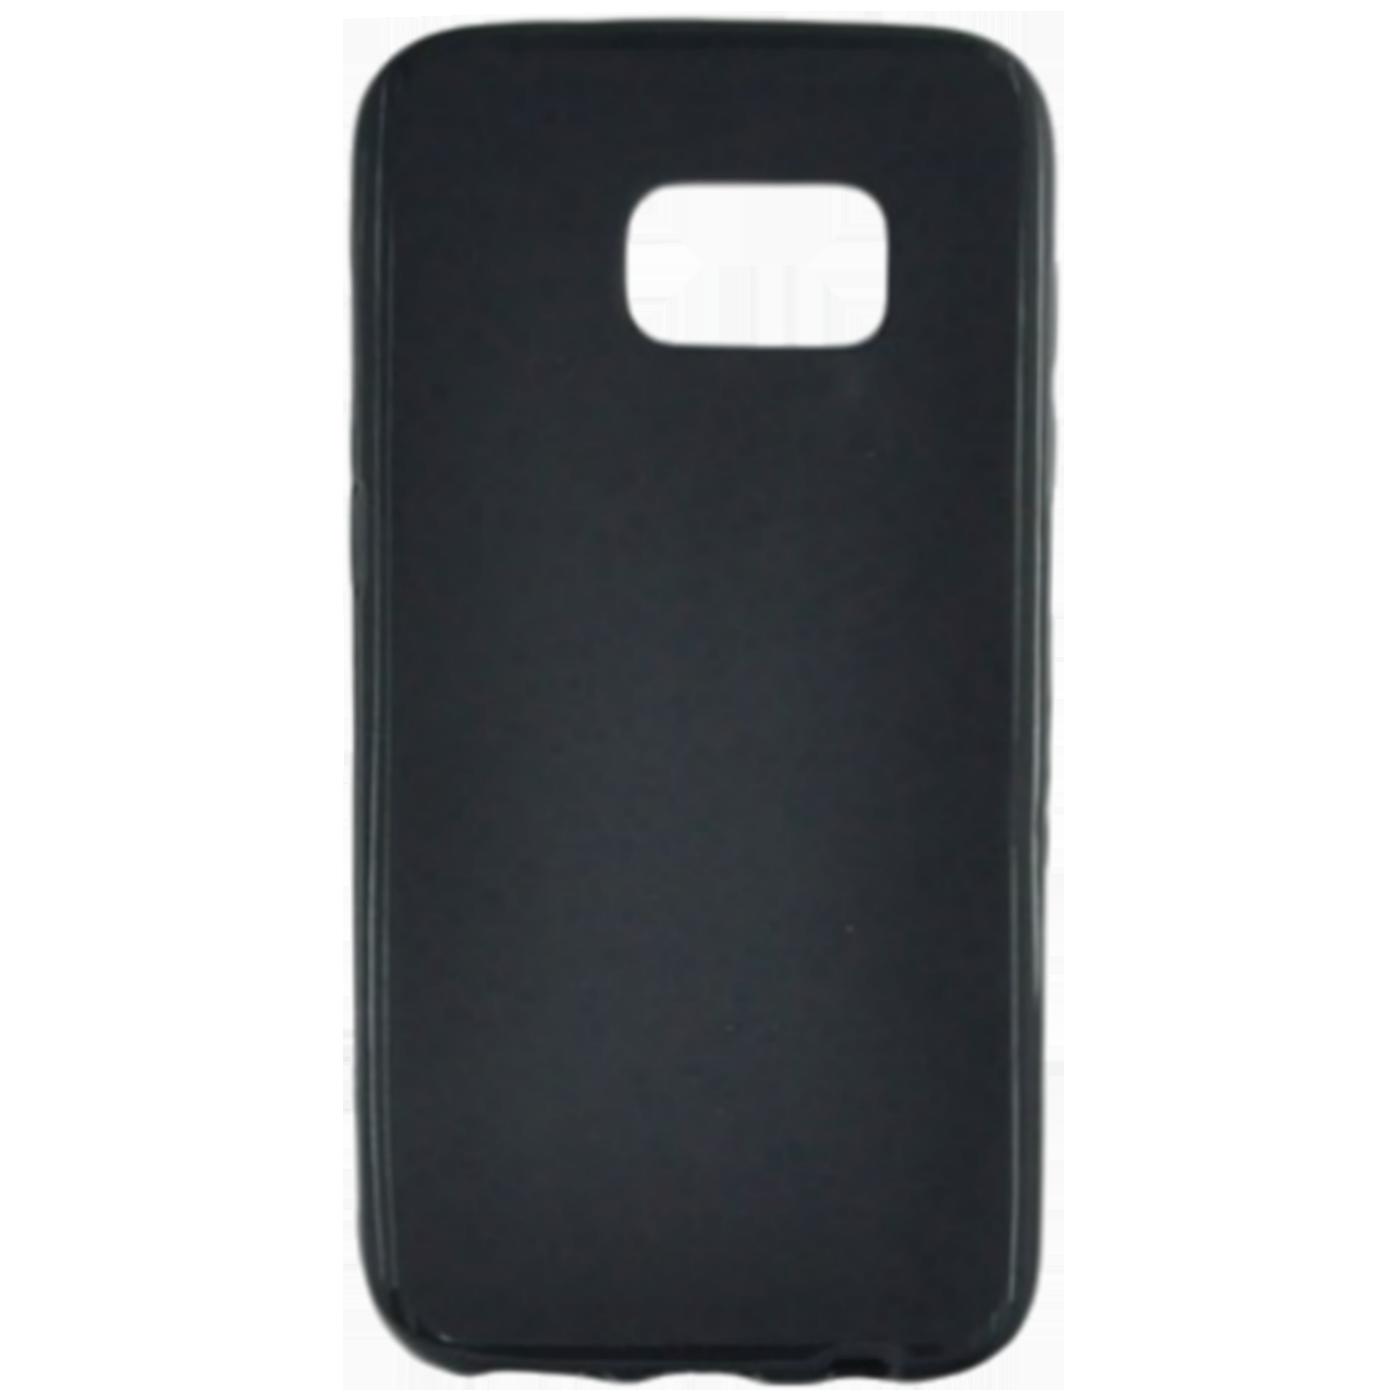 Futrola za mobitel Samsung S6 edge, crna